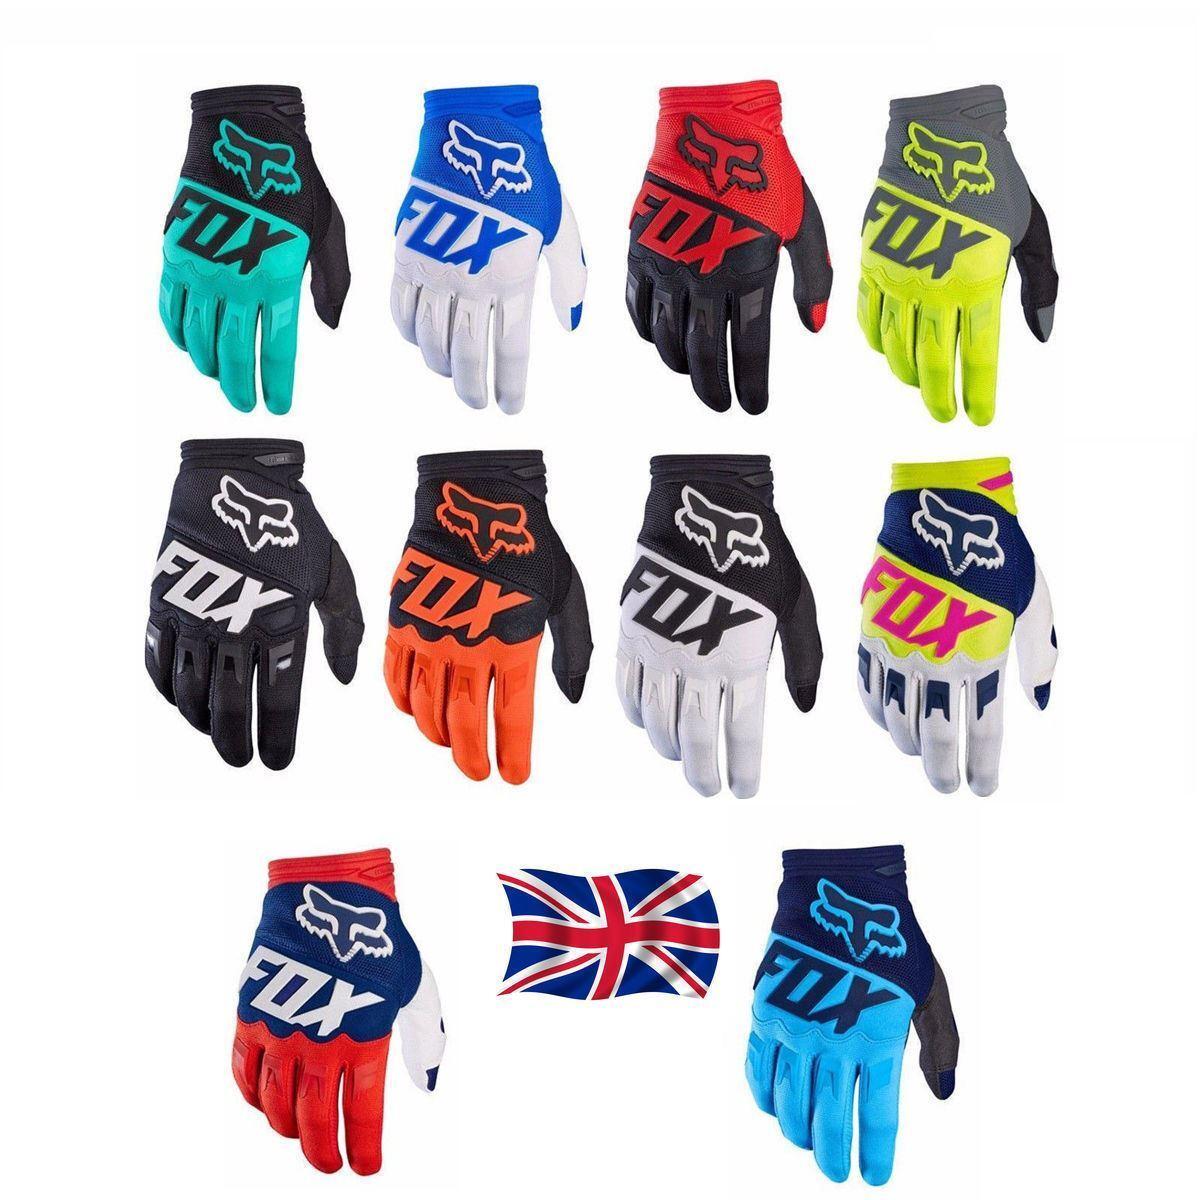 NEW FOX Glove Racing Motorcycle Gloves Cycling Bicycle MTB B